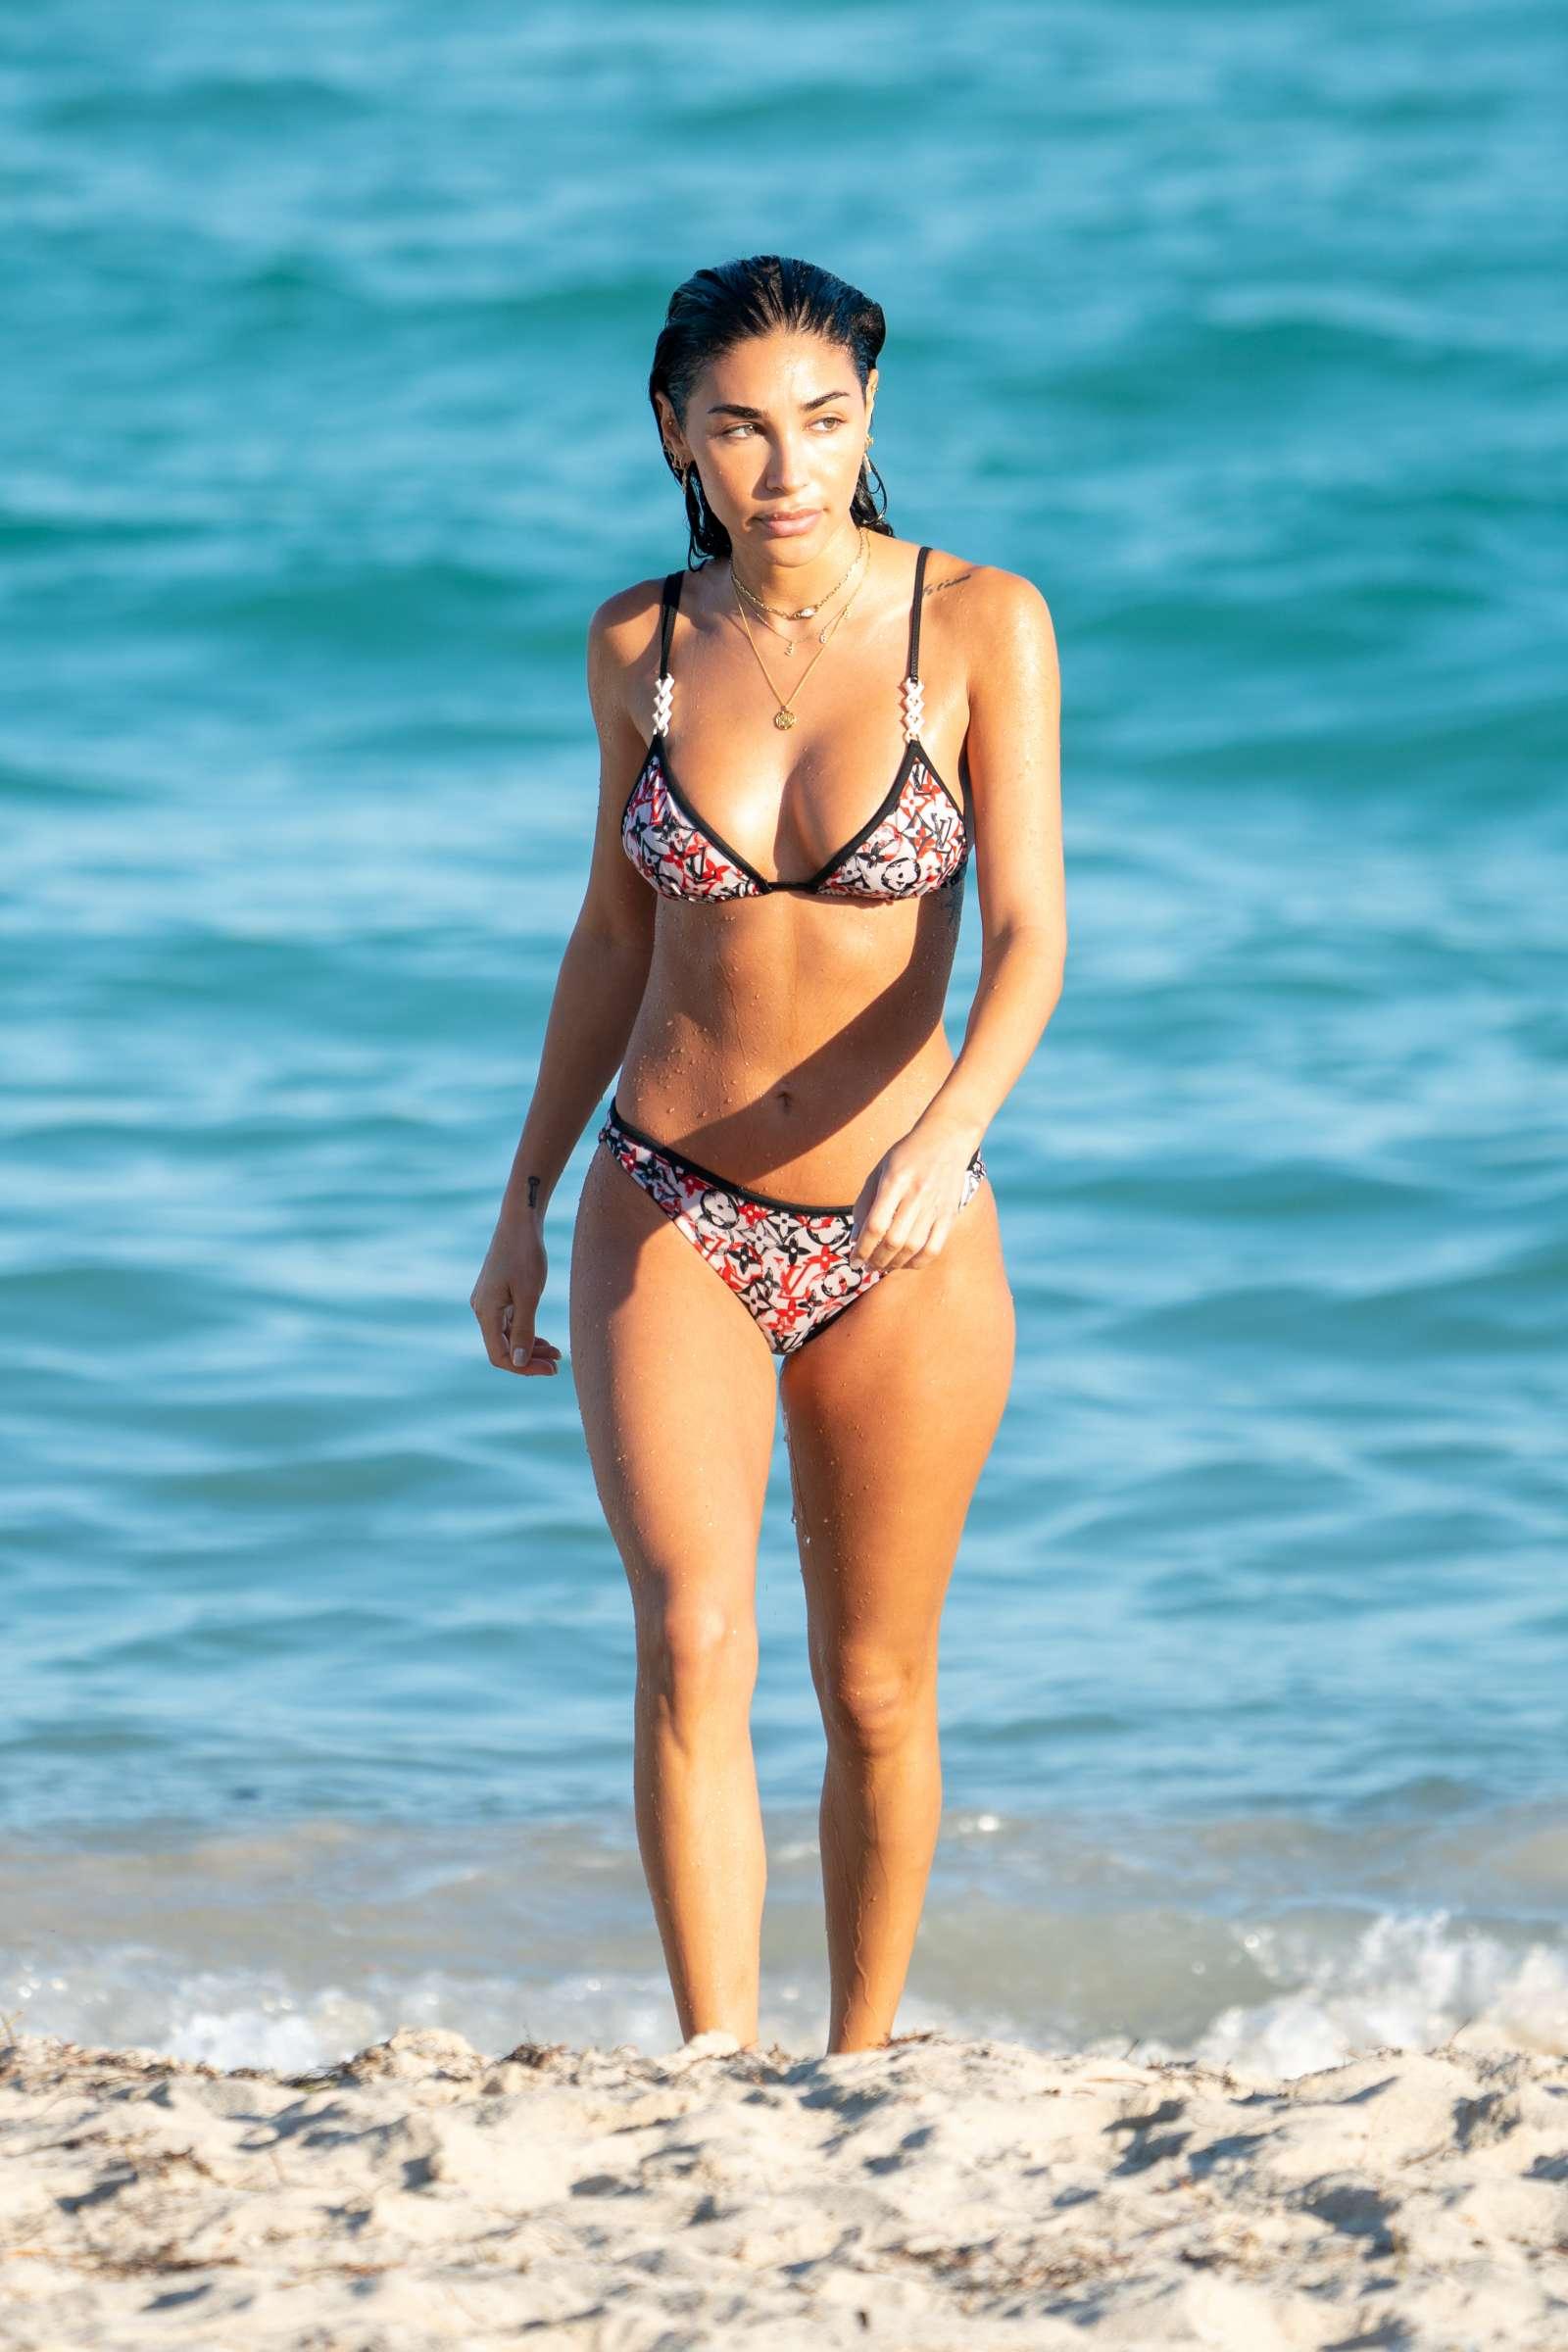 Chantel Jeffries 2018 : Chantel Jeffries in Bikini 2018 -27